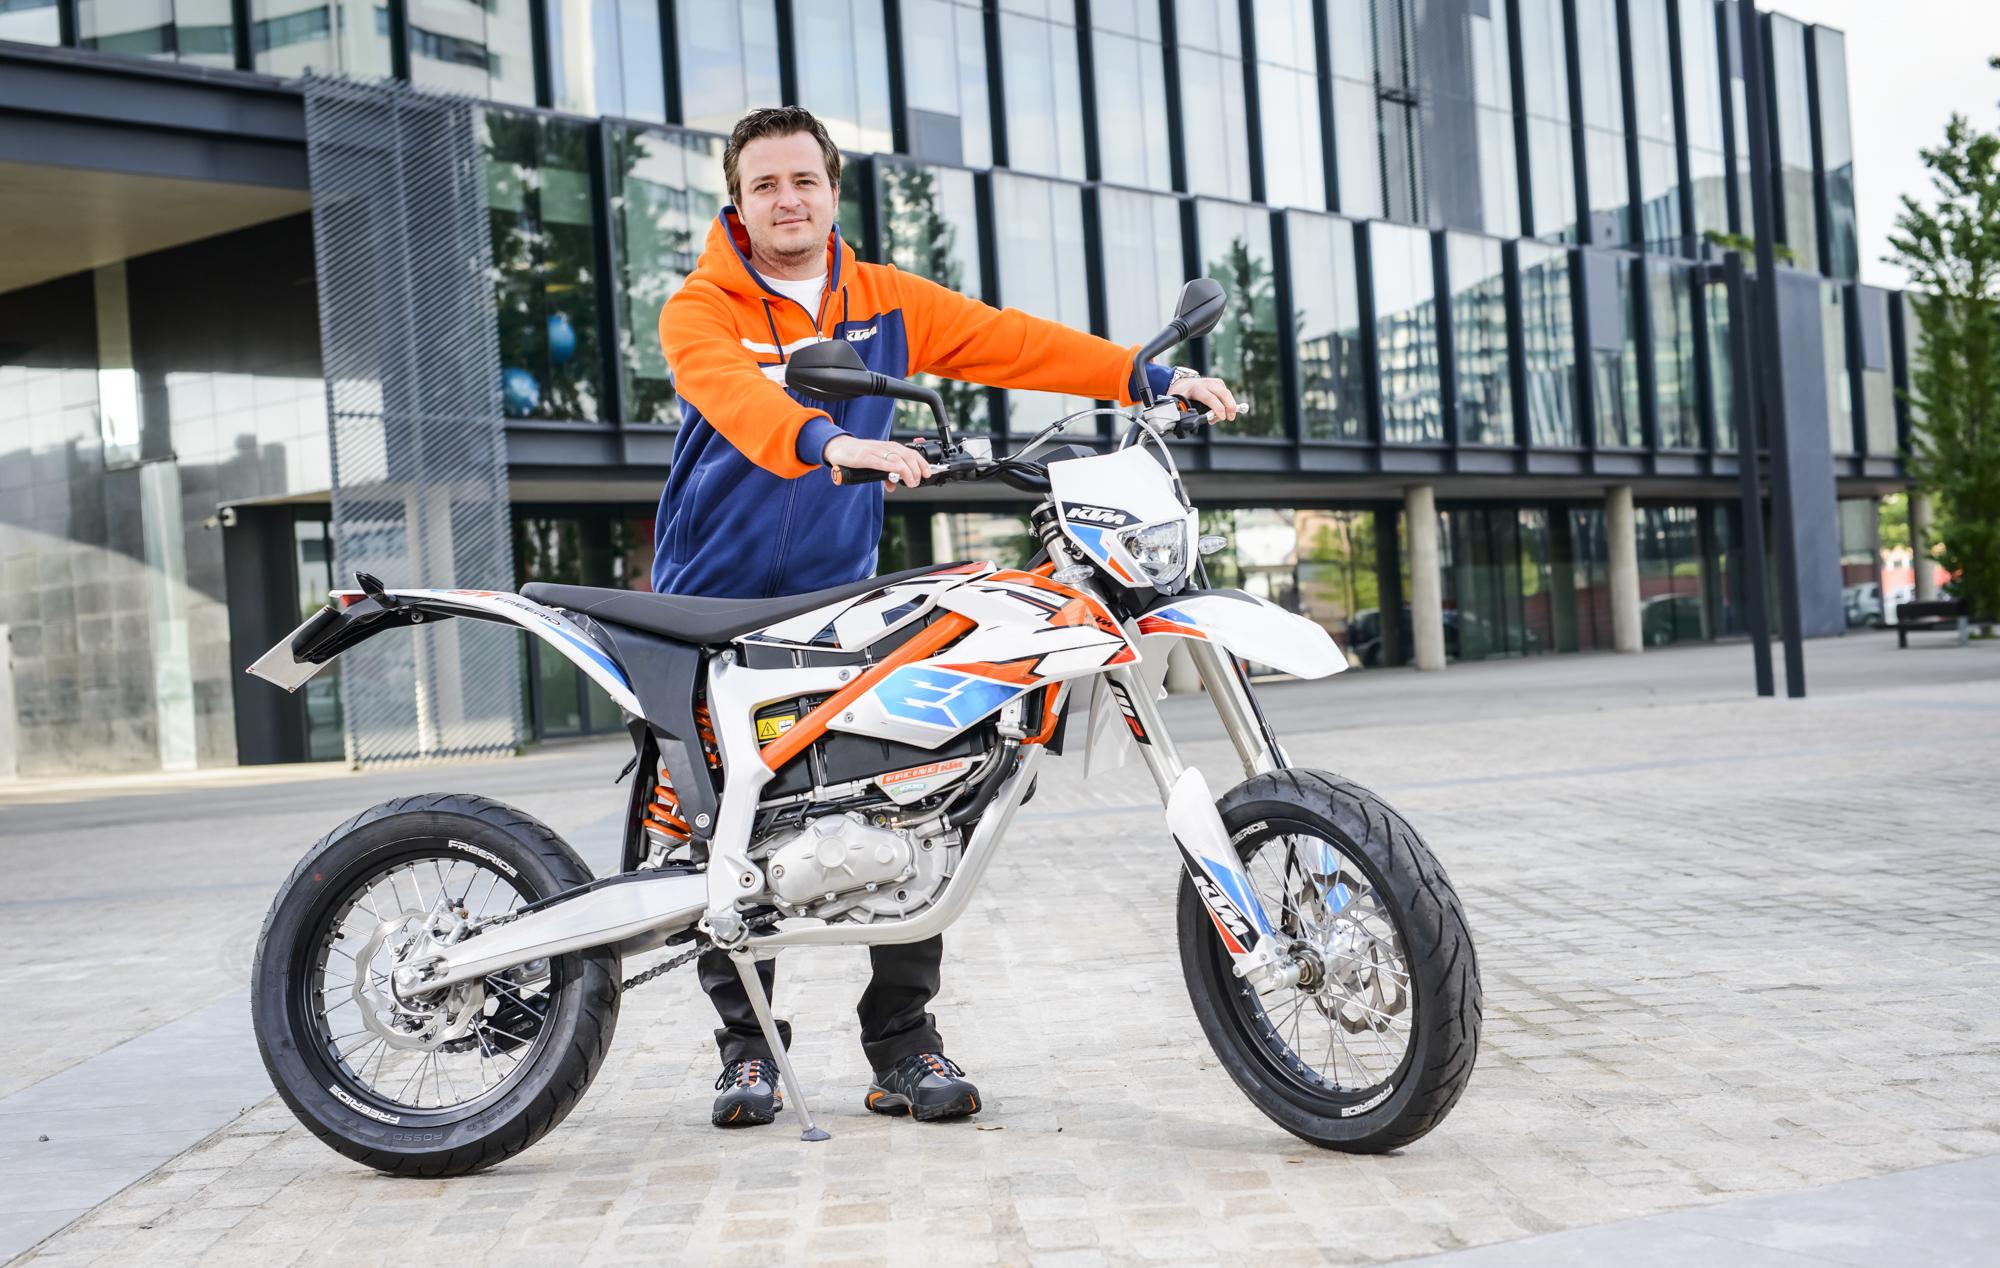 Ktm Freeride E Sm >> Interview des Monats: Arno Ebner über die KTM FREERIDE E-SMKTM BLOG - KTM BLOG